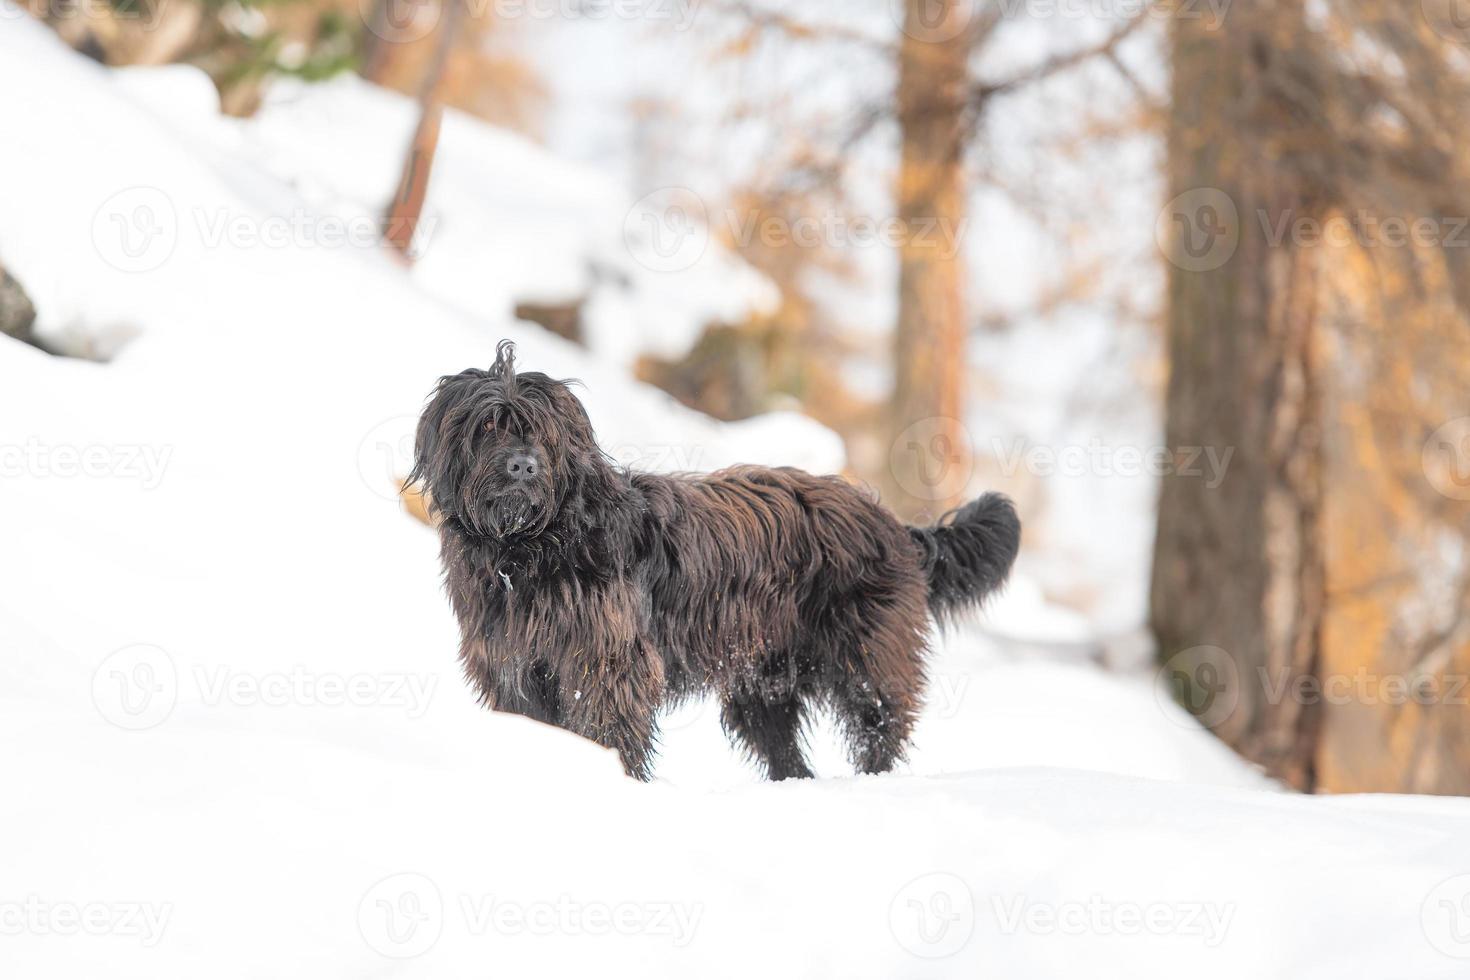 herdehund i snön i en skog foto